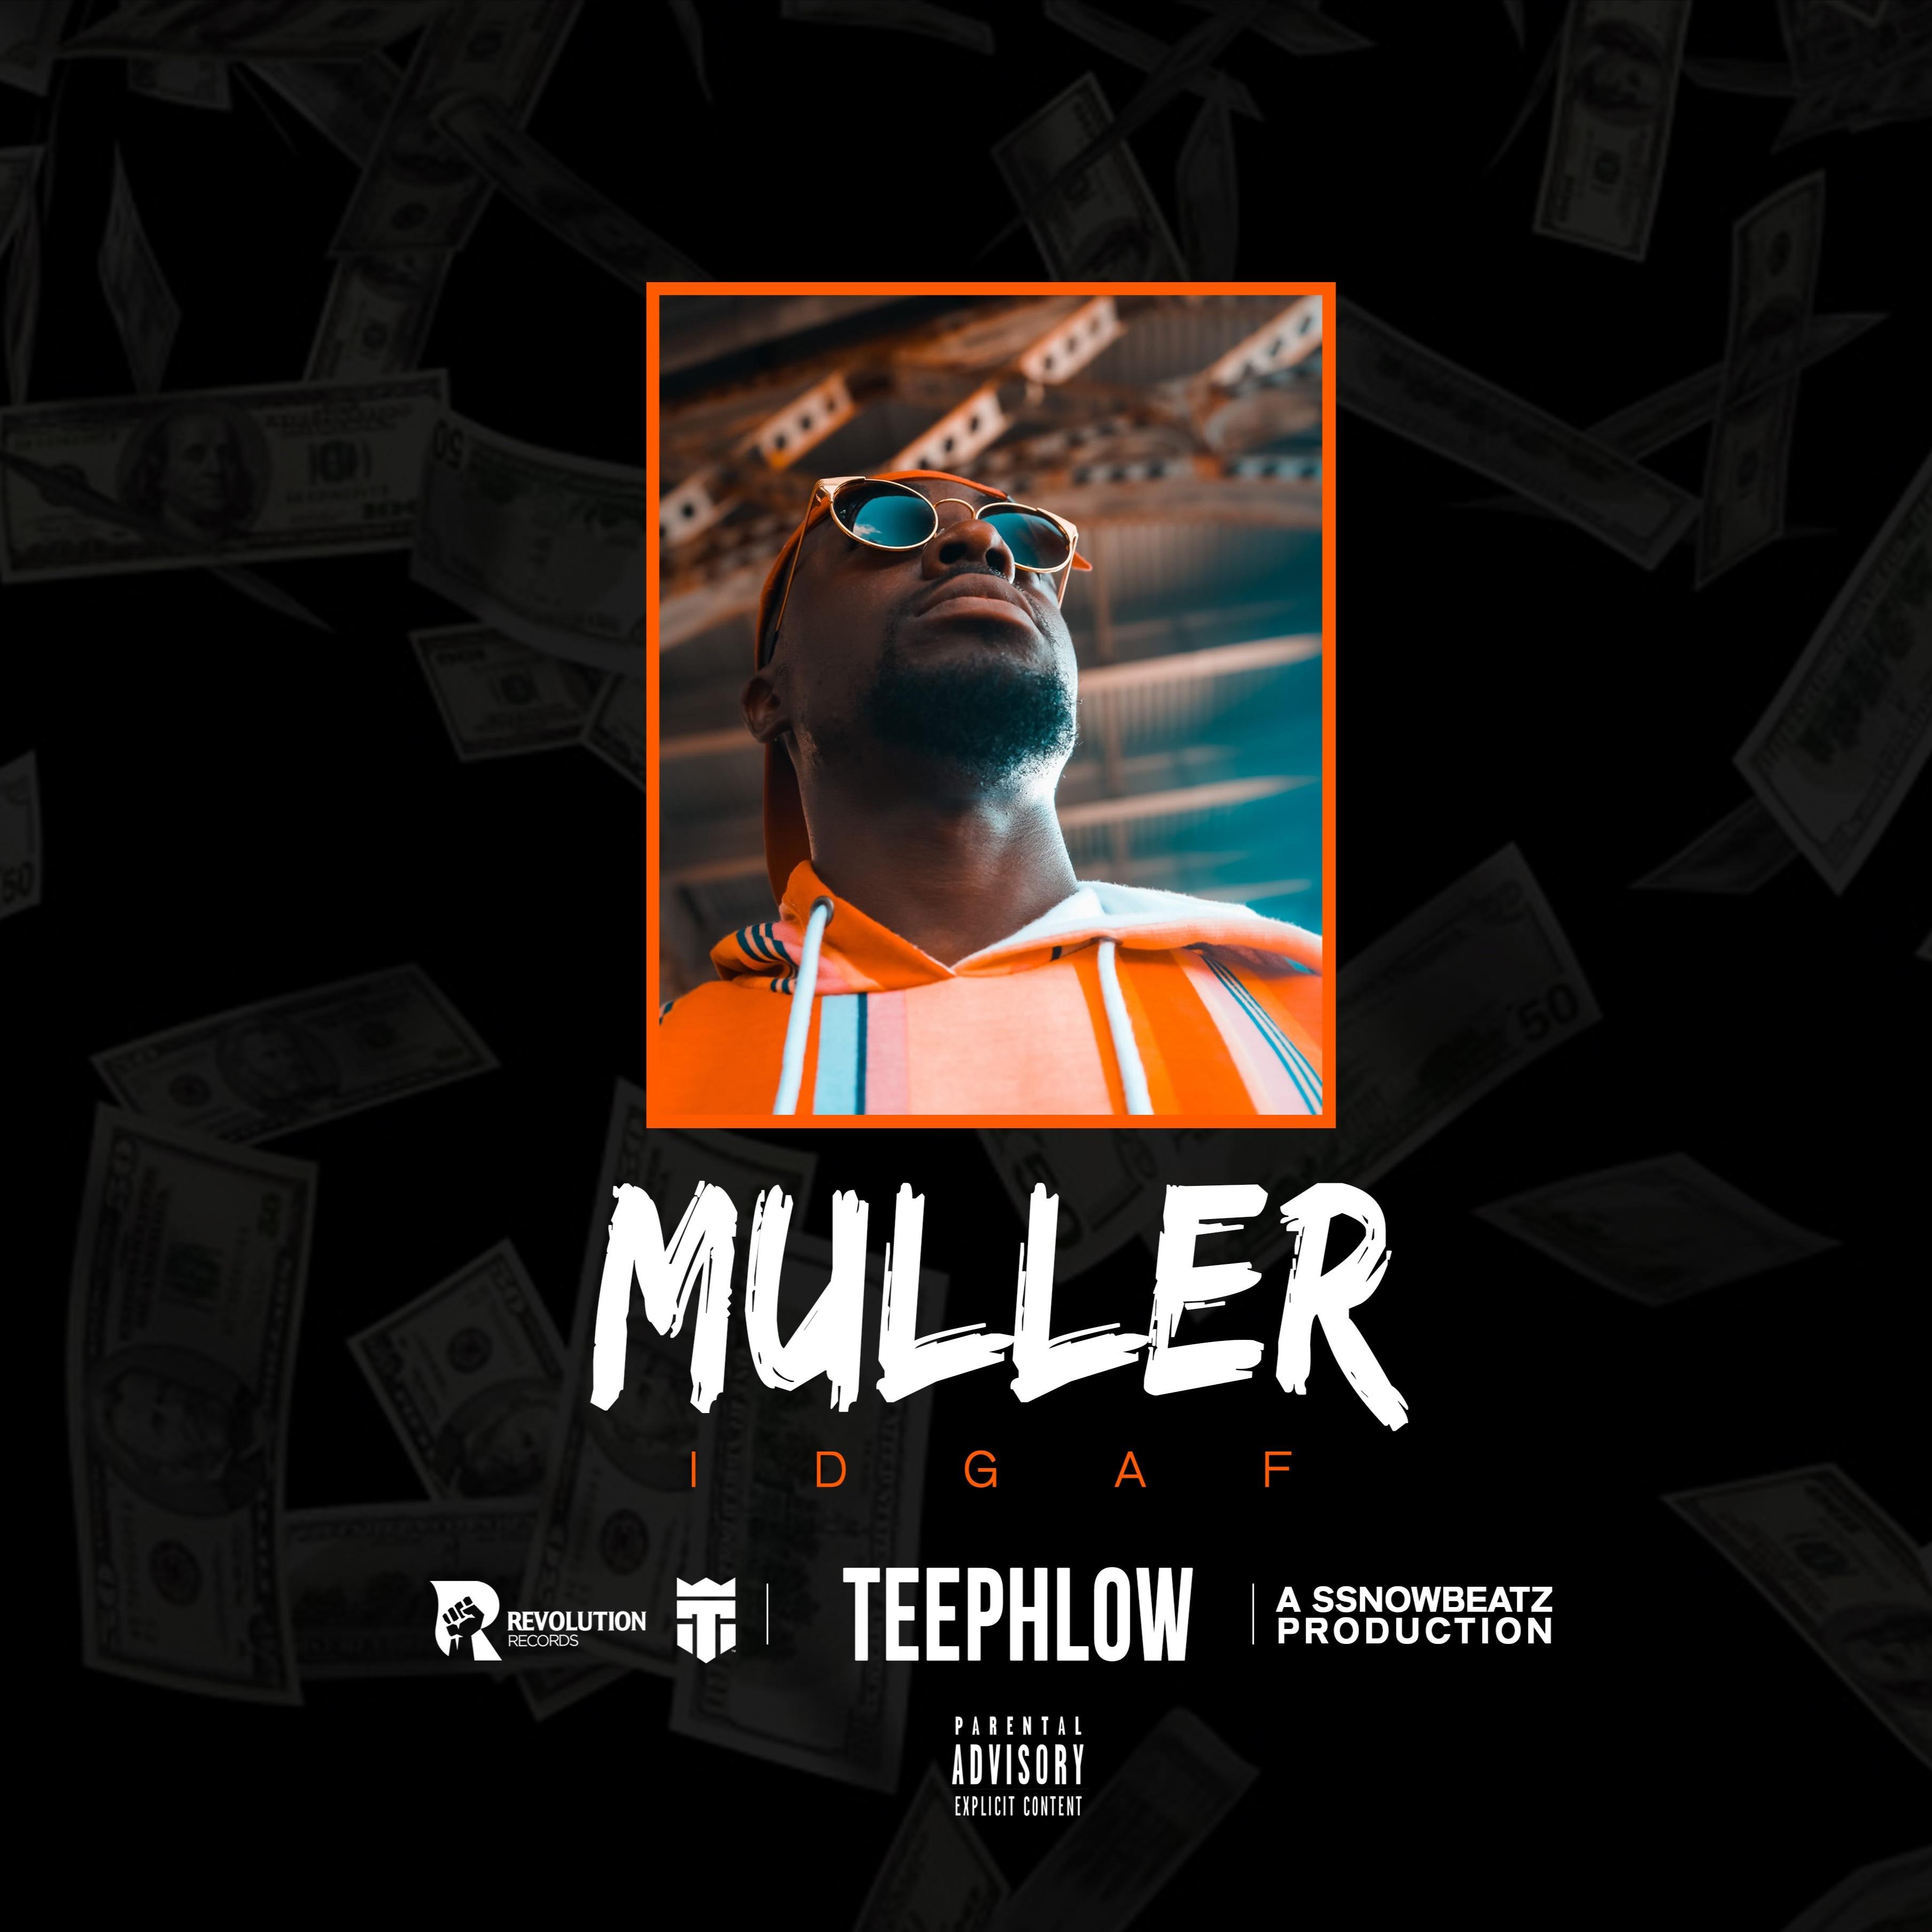 Teephlow – Muller (IDGAF) (Prod. By Ssnowbeatz)